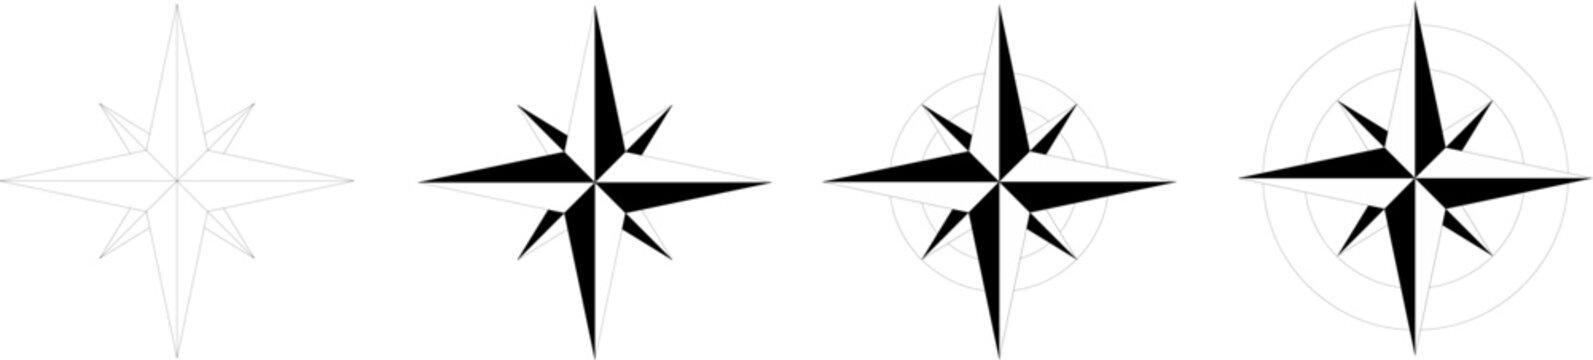 Wind rose - 4 models of compass rose